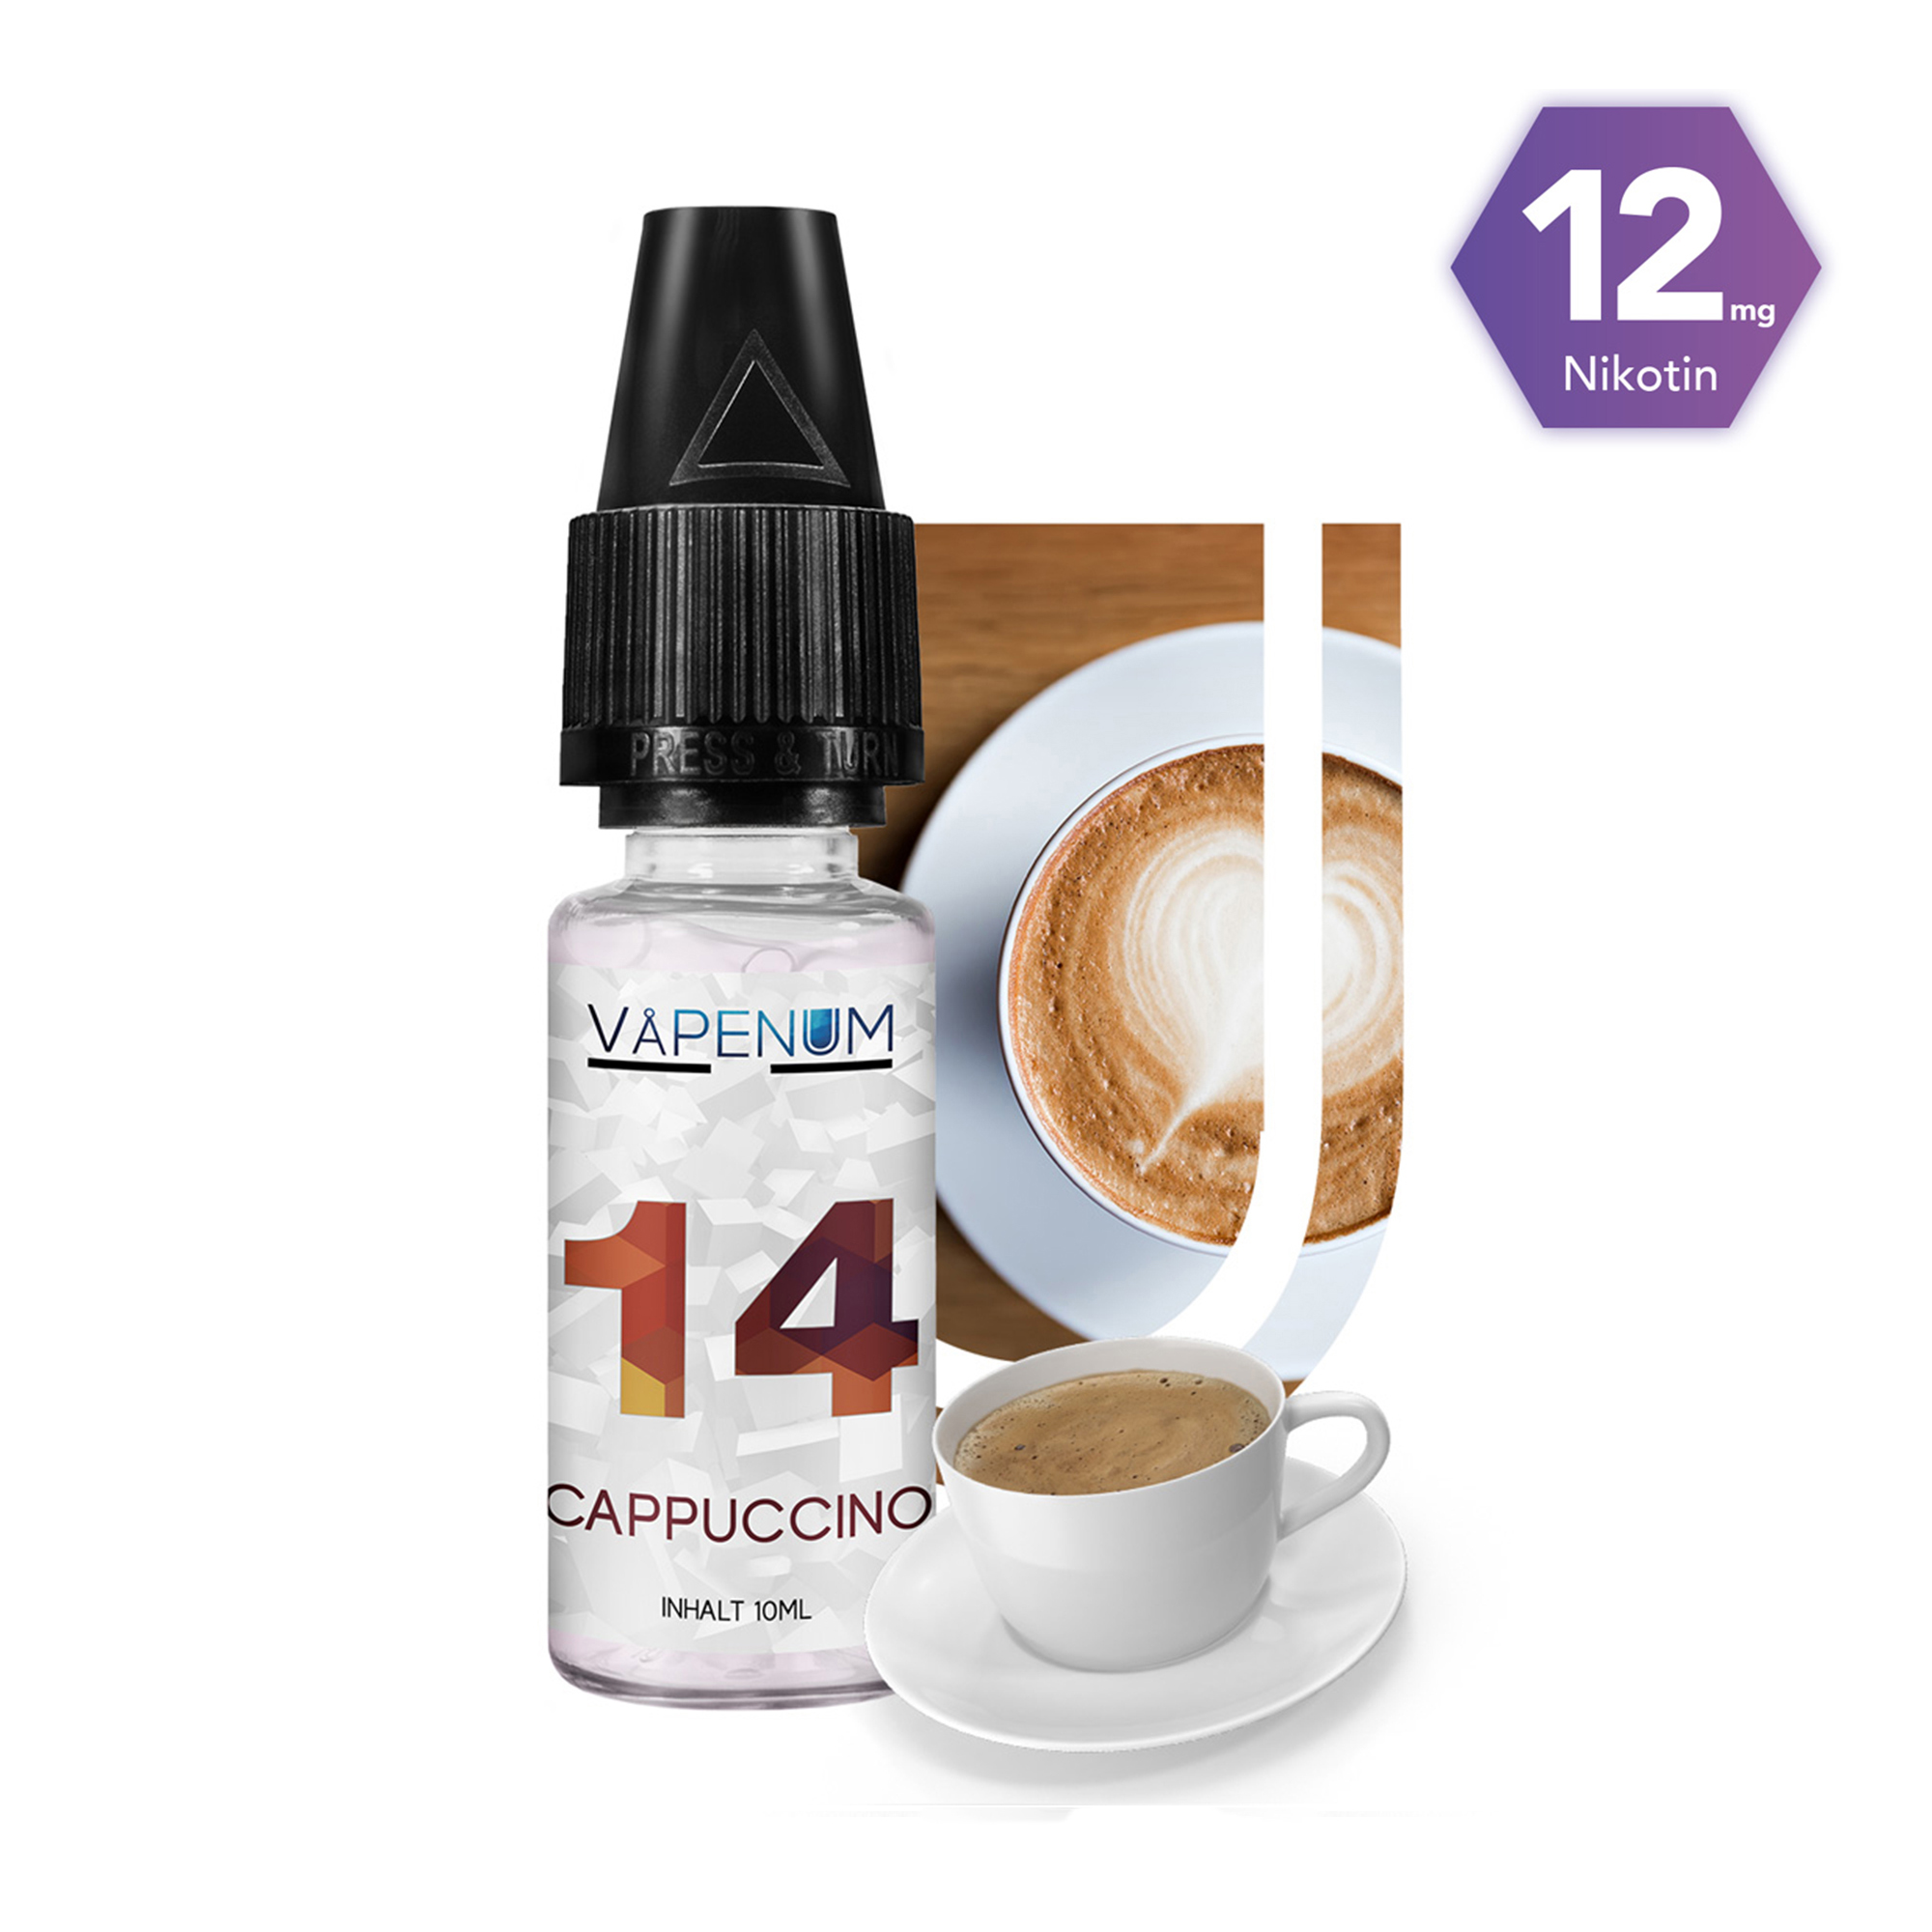 14 - Cappuccino Liquid by Vapenum 12mg